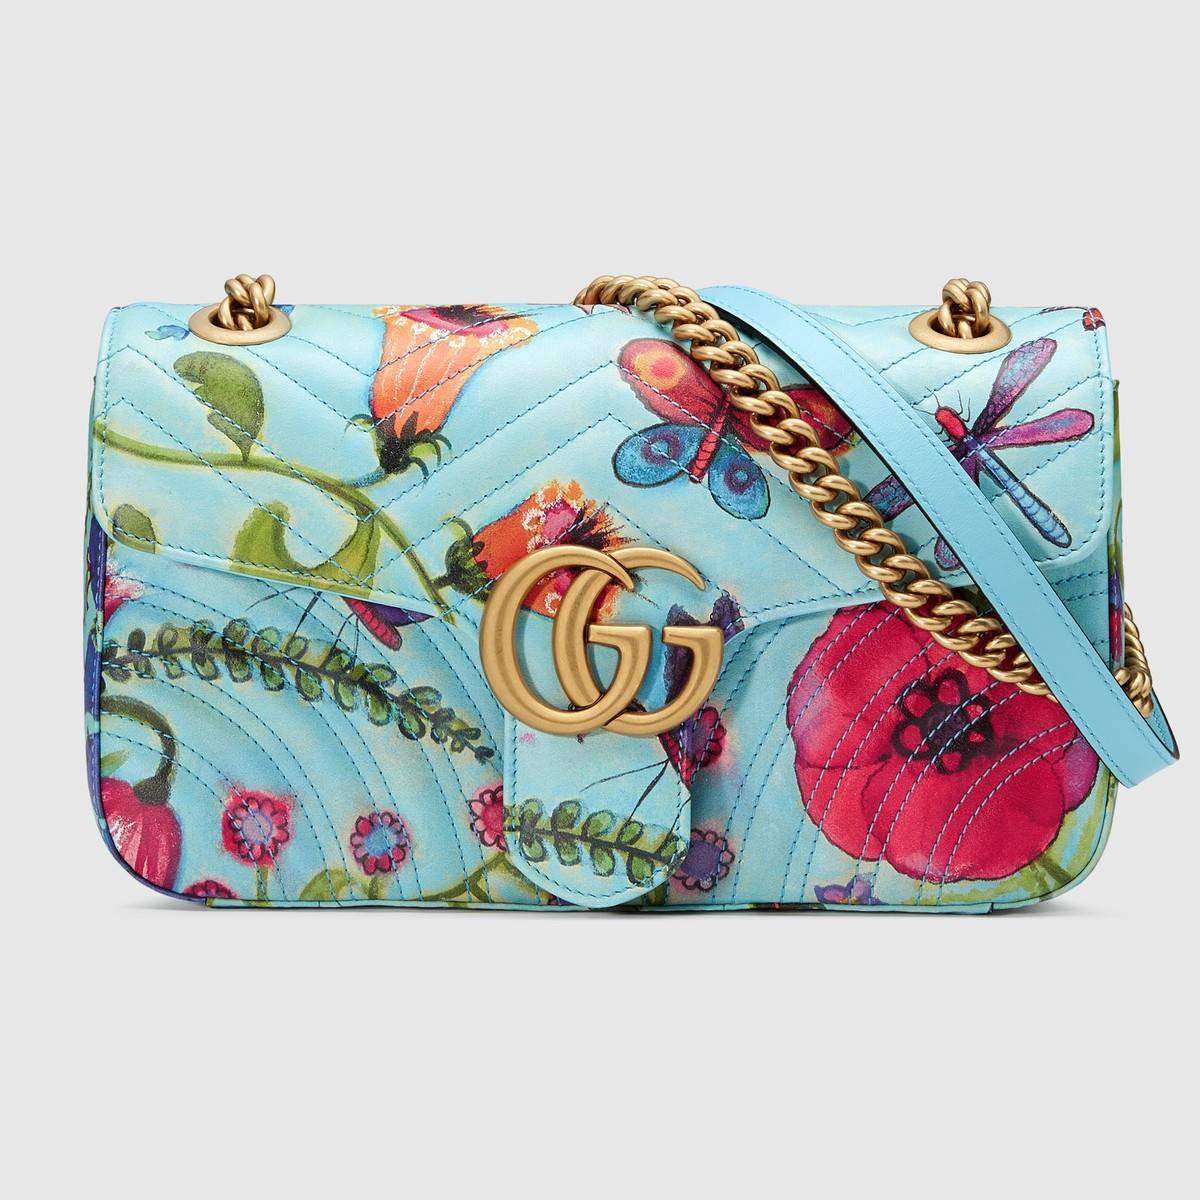 f63169667cee Gucci Unskilled Worker Gg Marmont Shoulder Bag | ModeSens